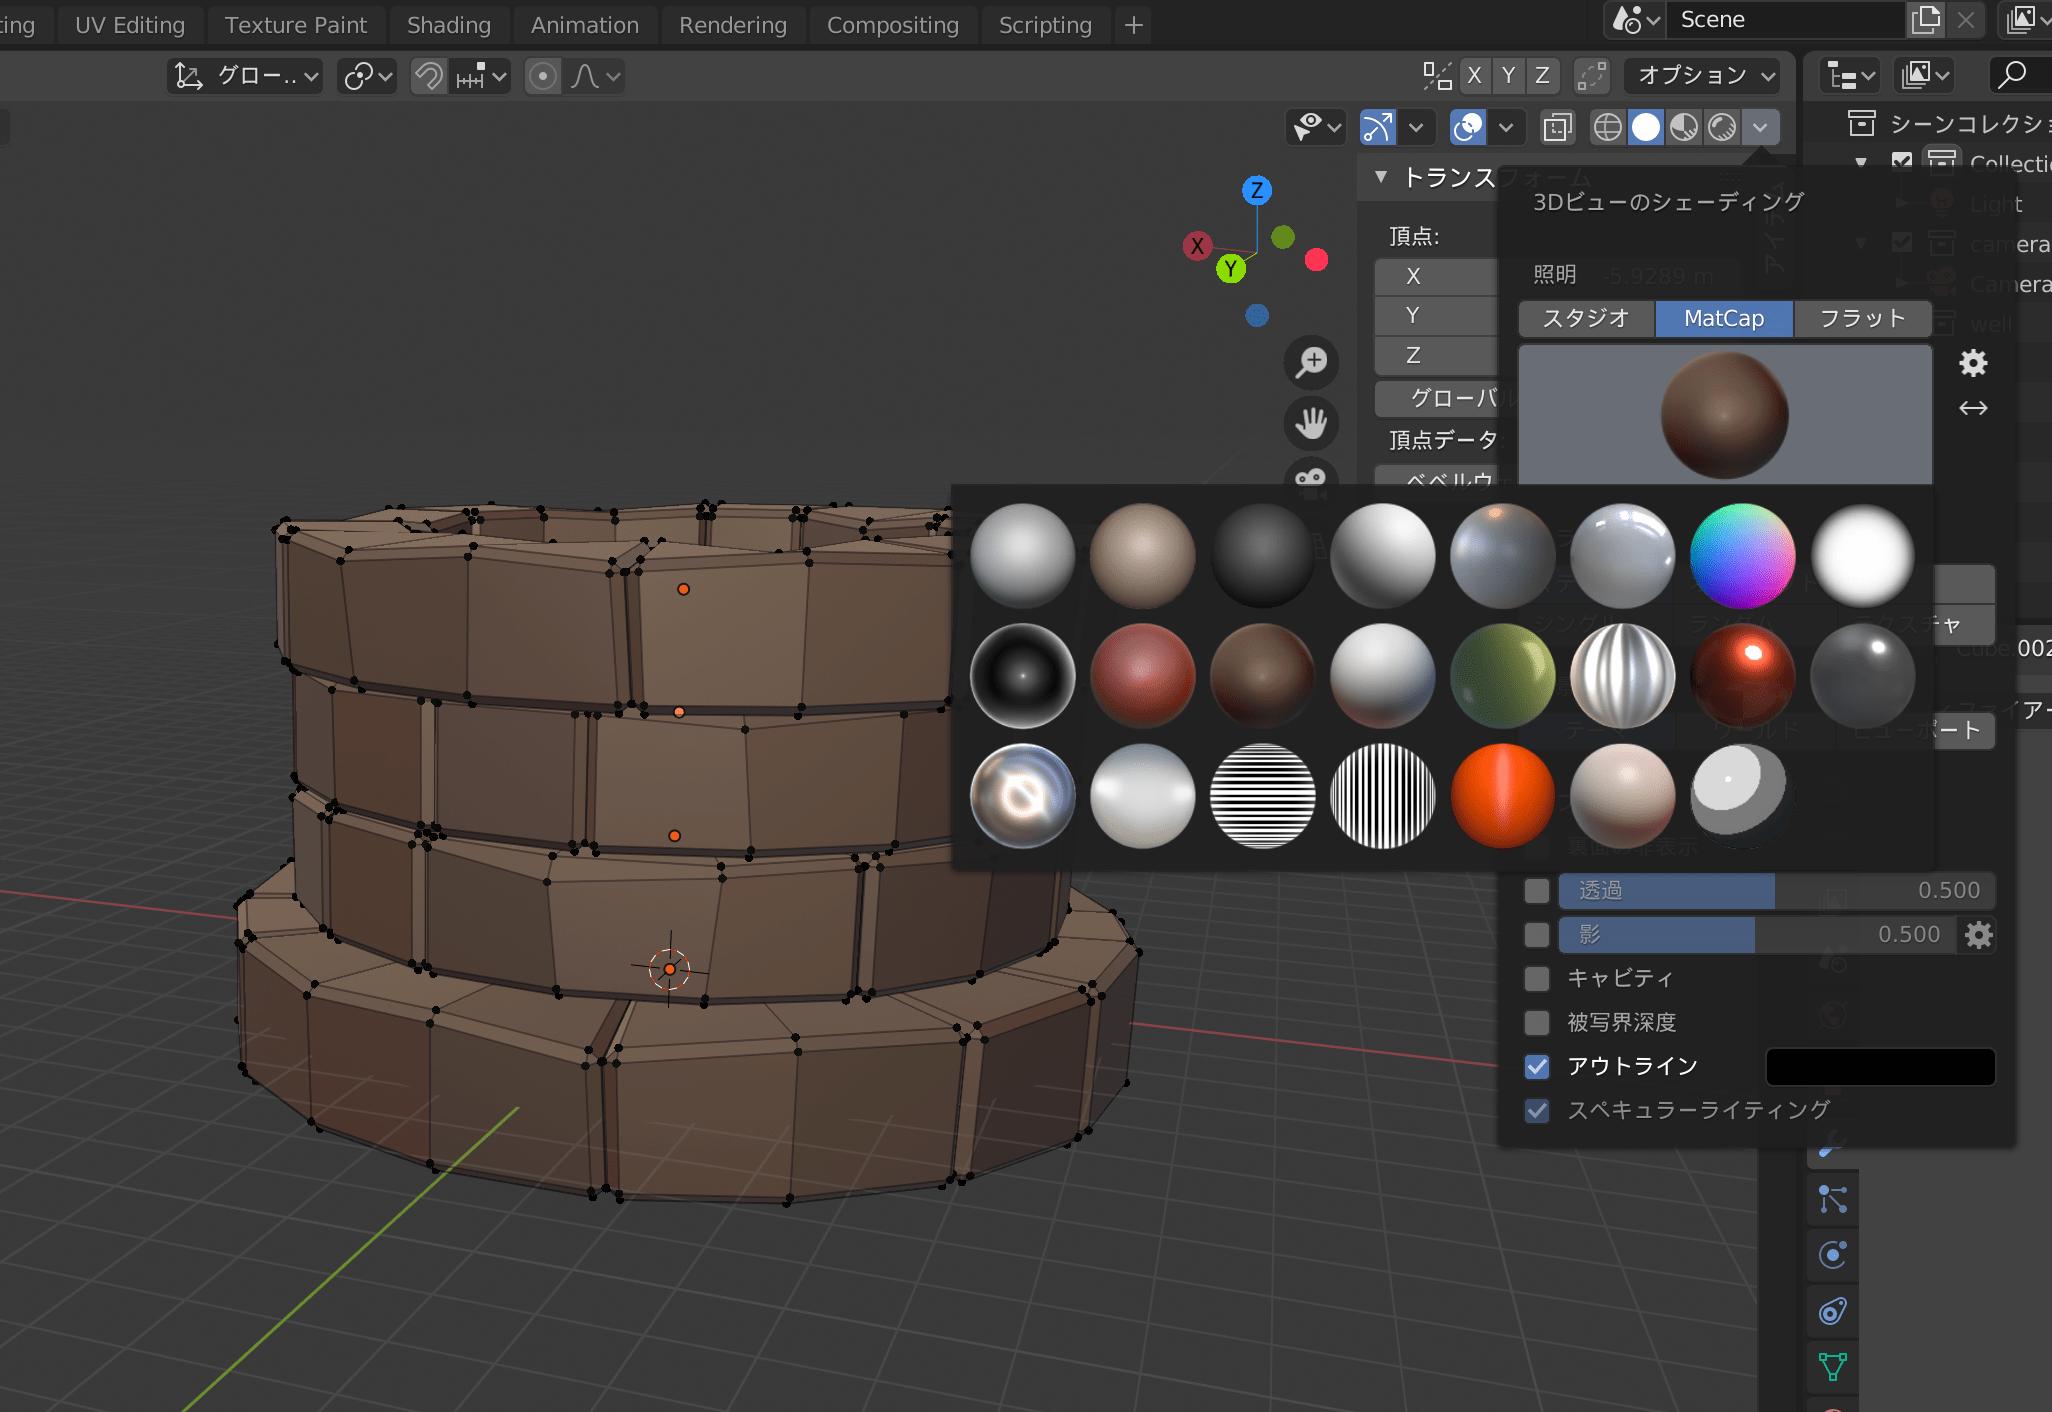 blender2.8 3Dシェーディング